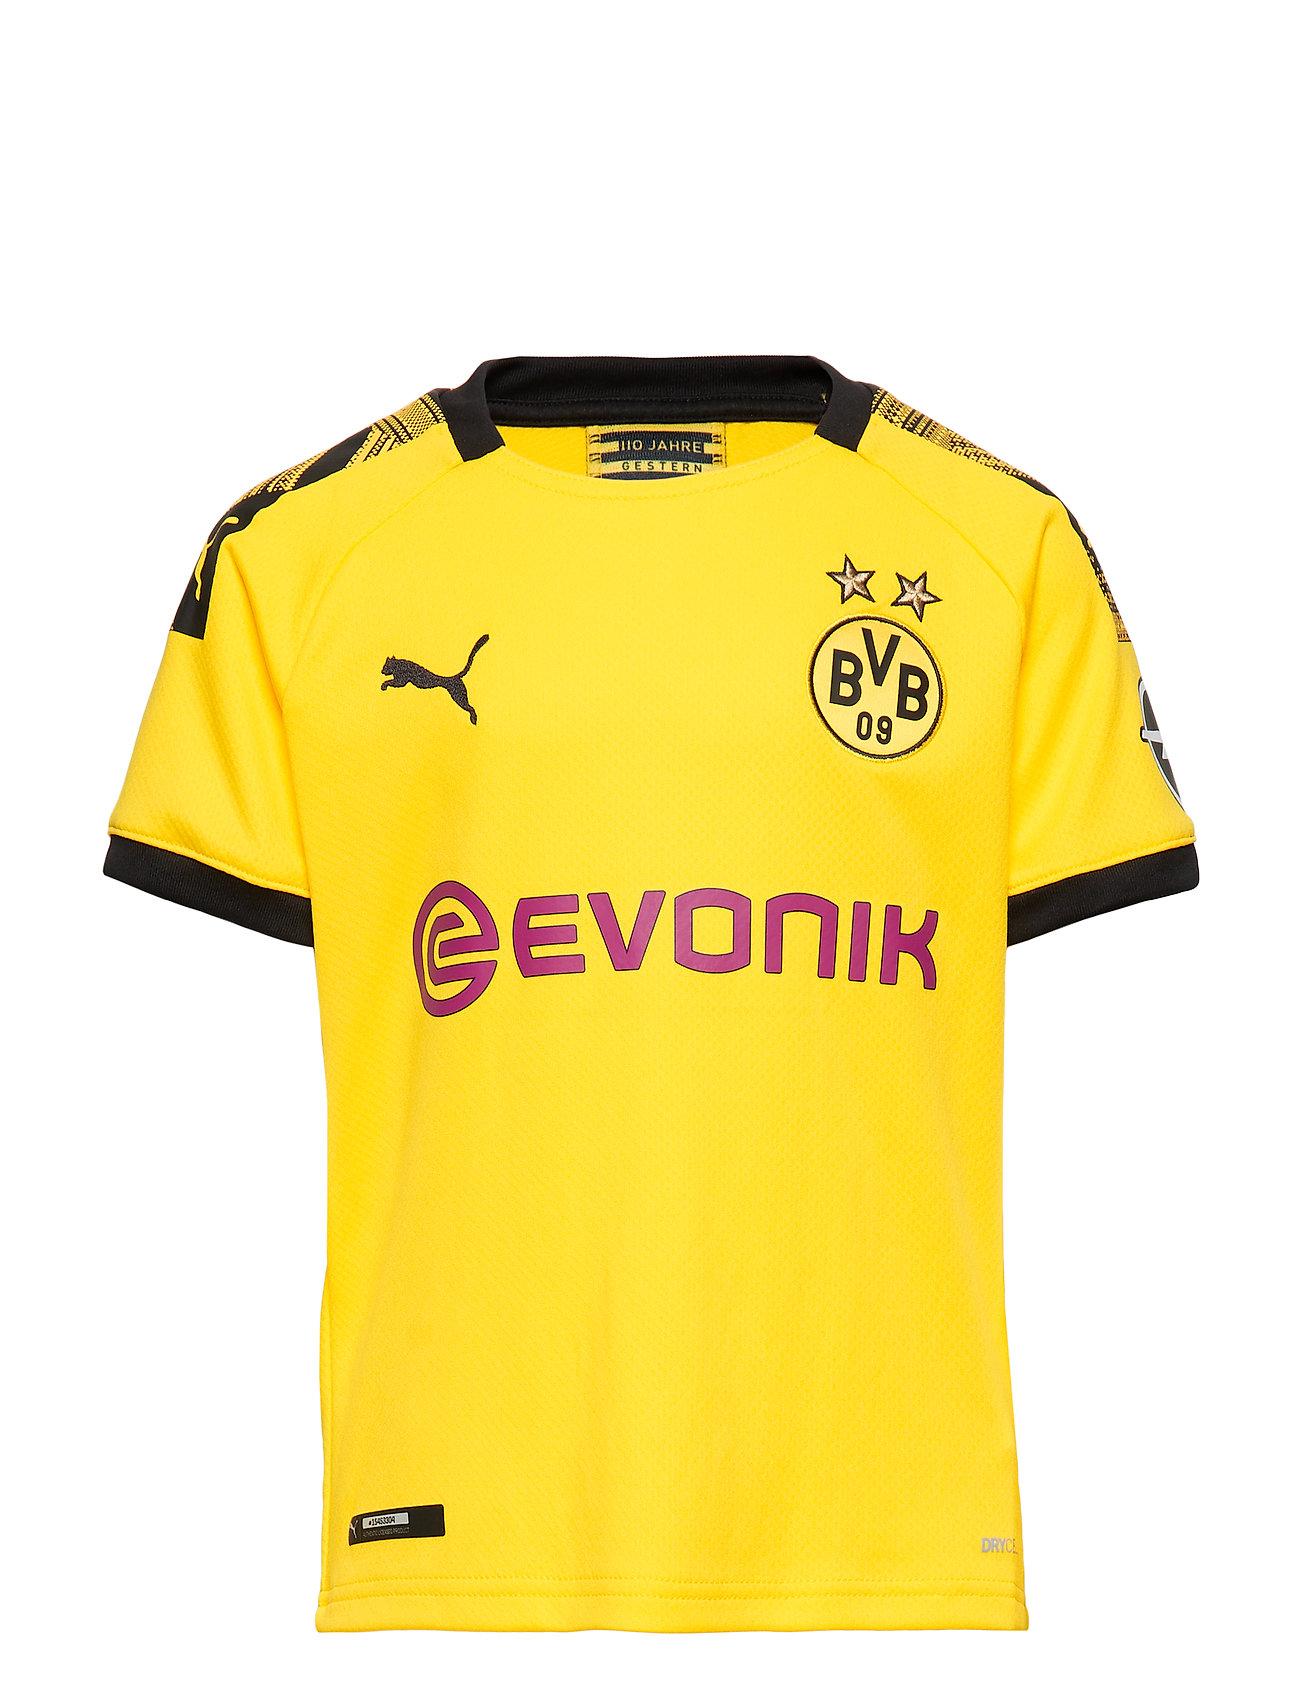 PUMA BVB Home Shirt Replica Jr with Evonik Logo with OPEL Logo - CYBER YELLOW-PUMA BLACK